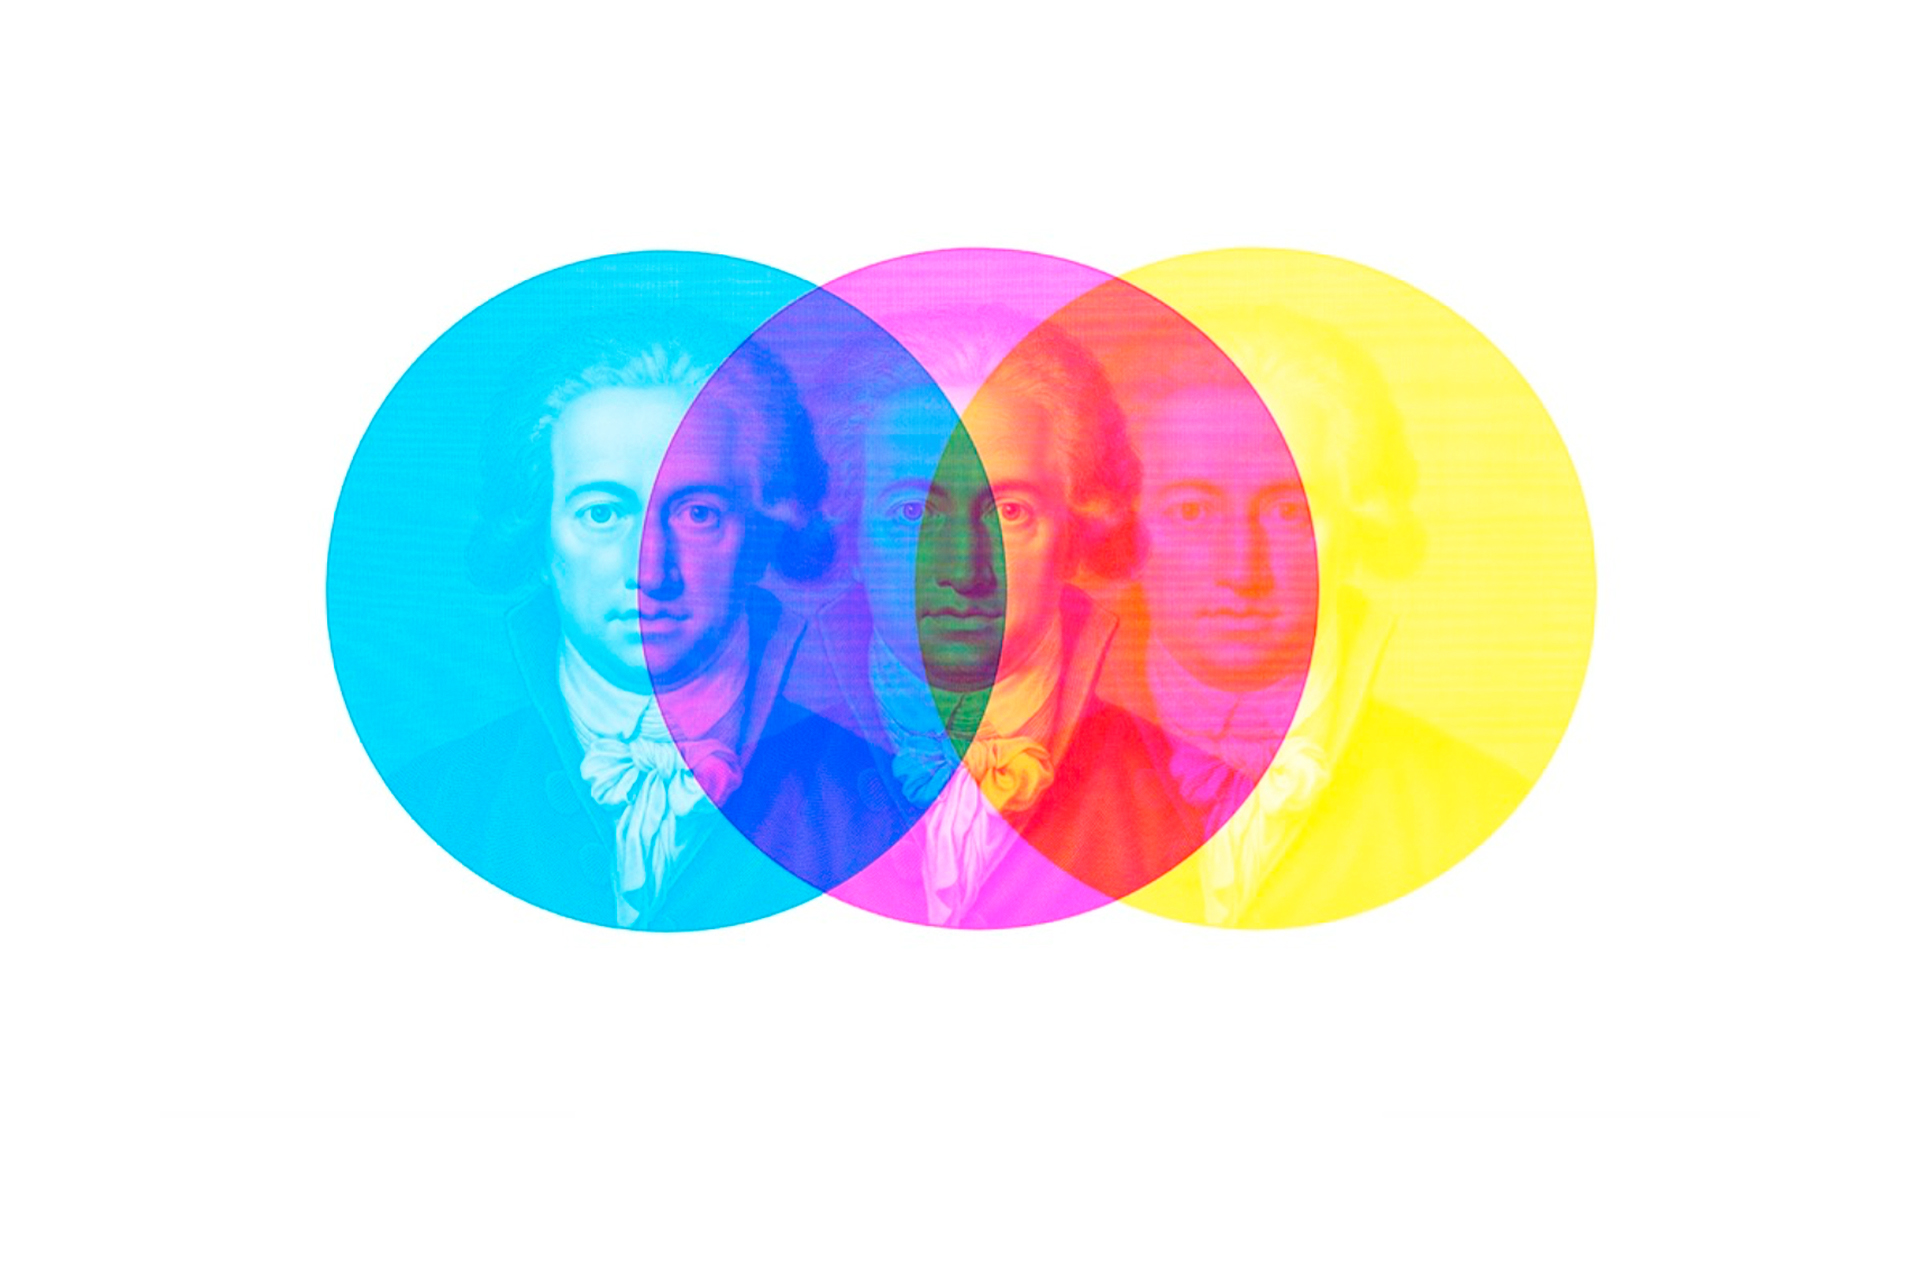 Goethe's Colour Theory